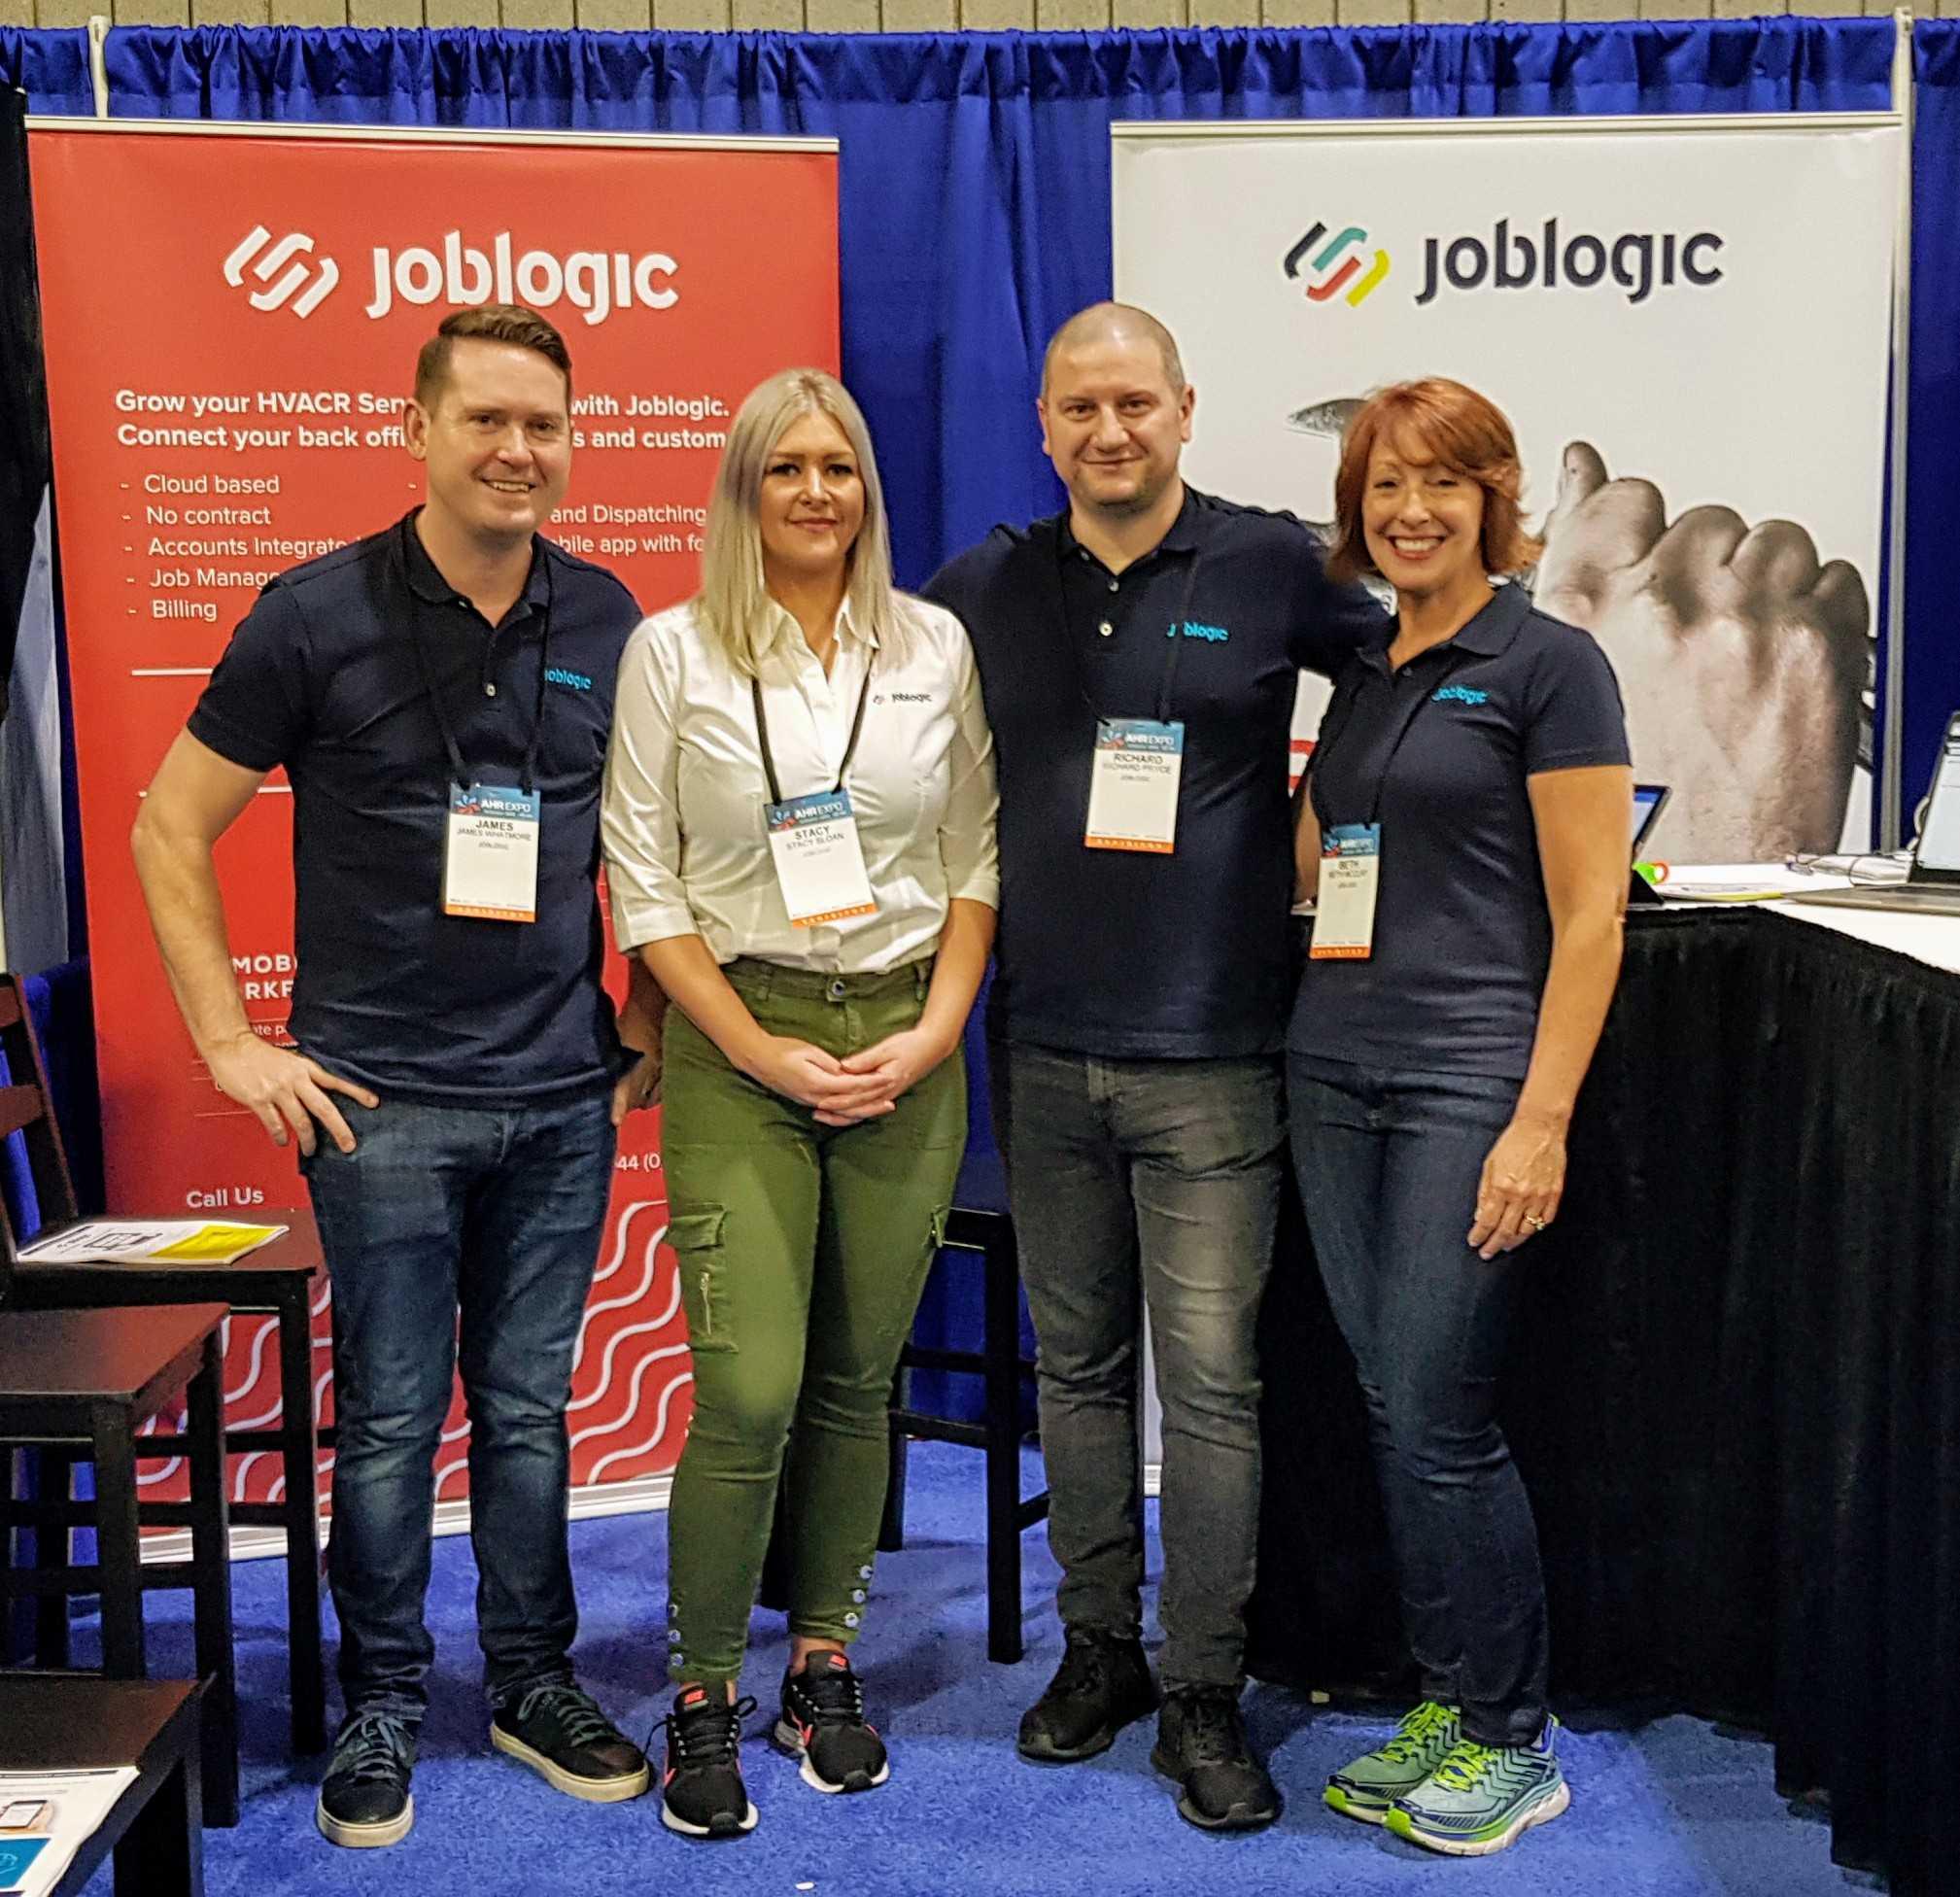 Joblogic Team at the AHR Expo 2019